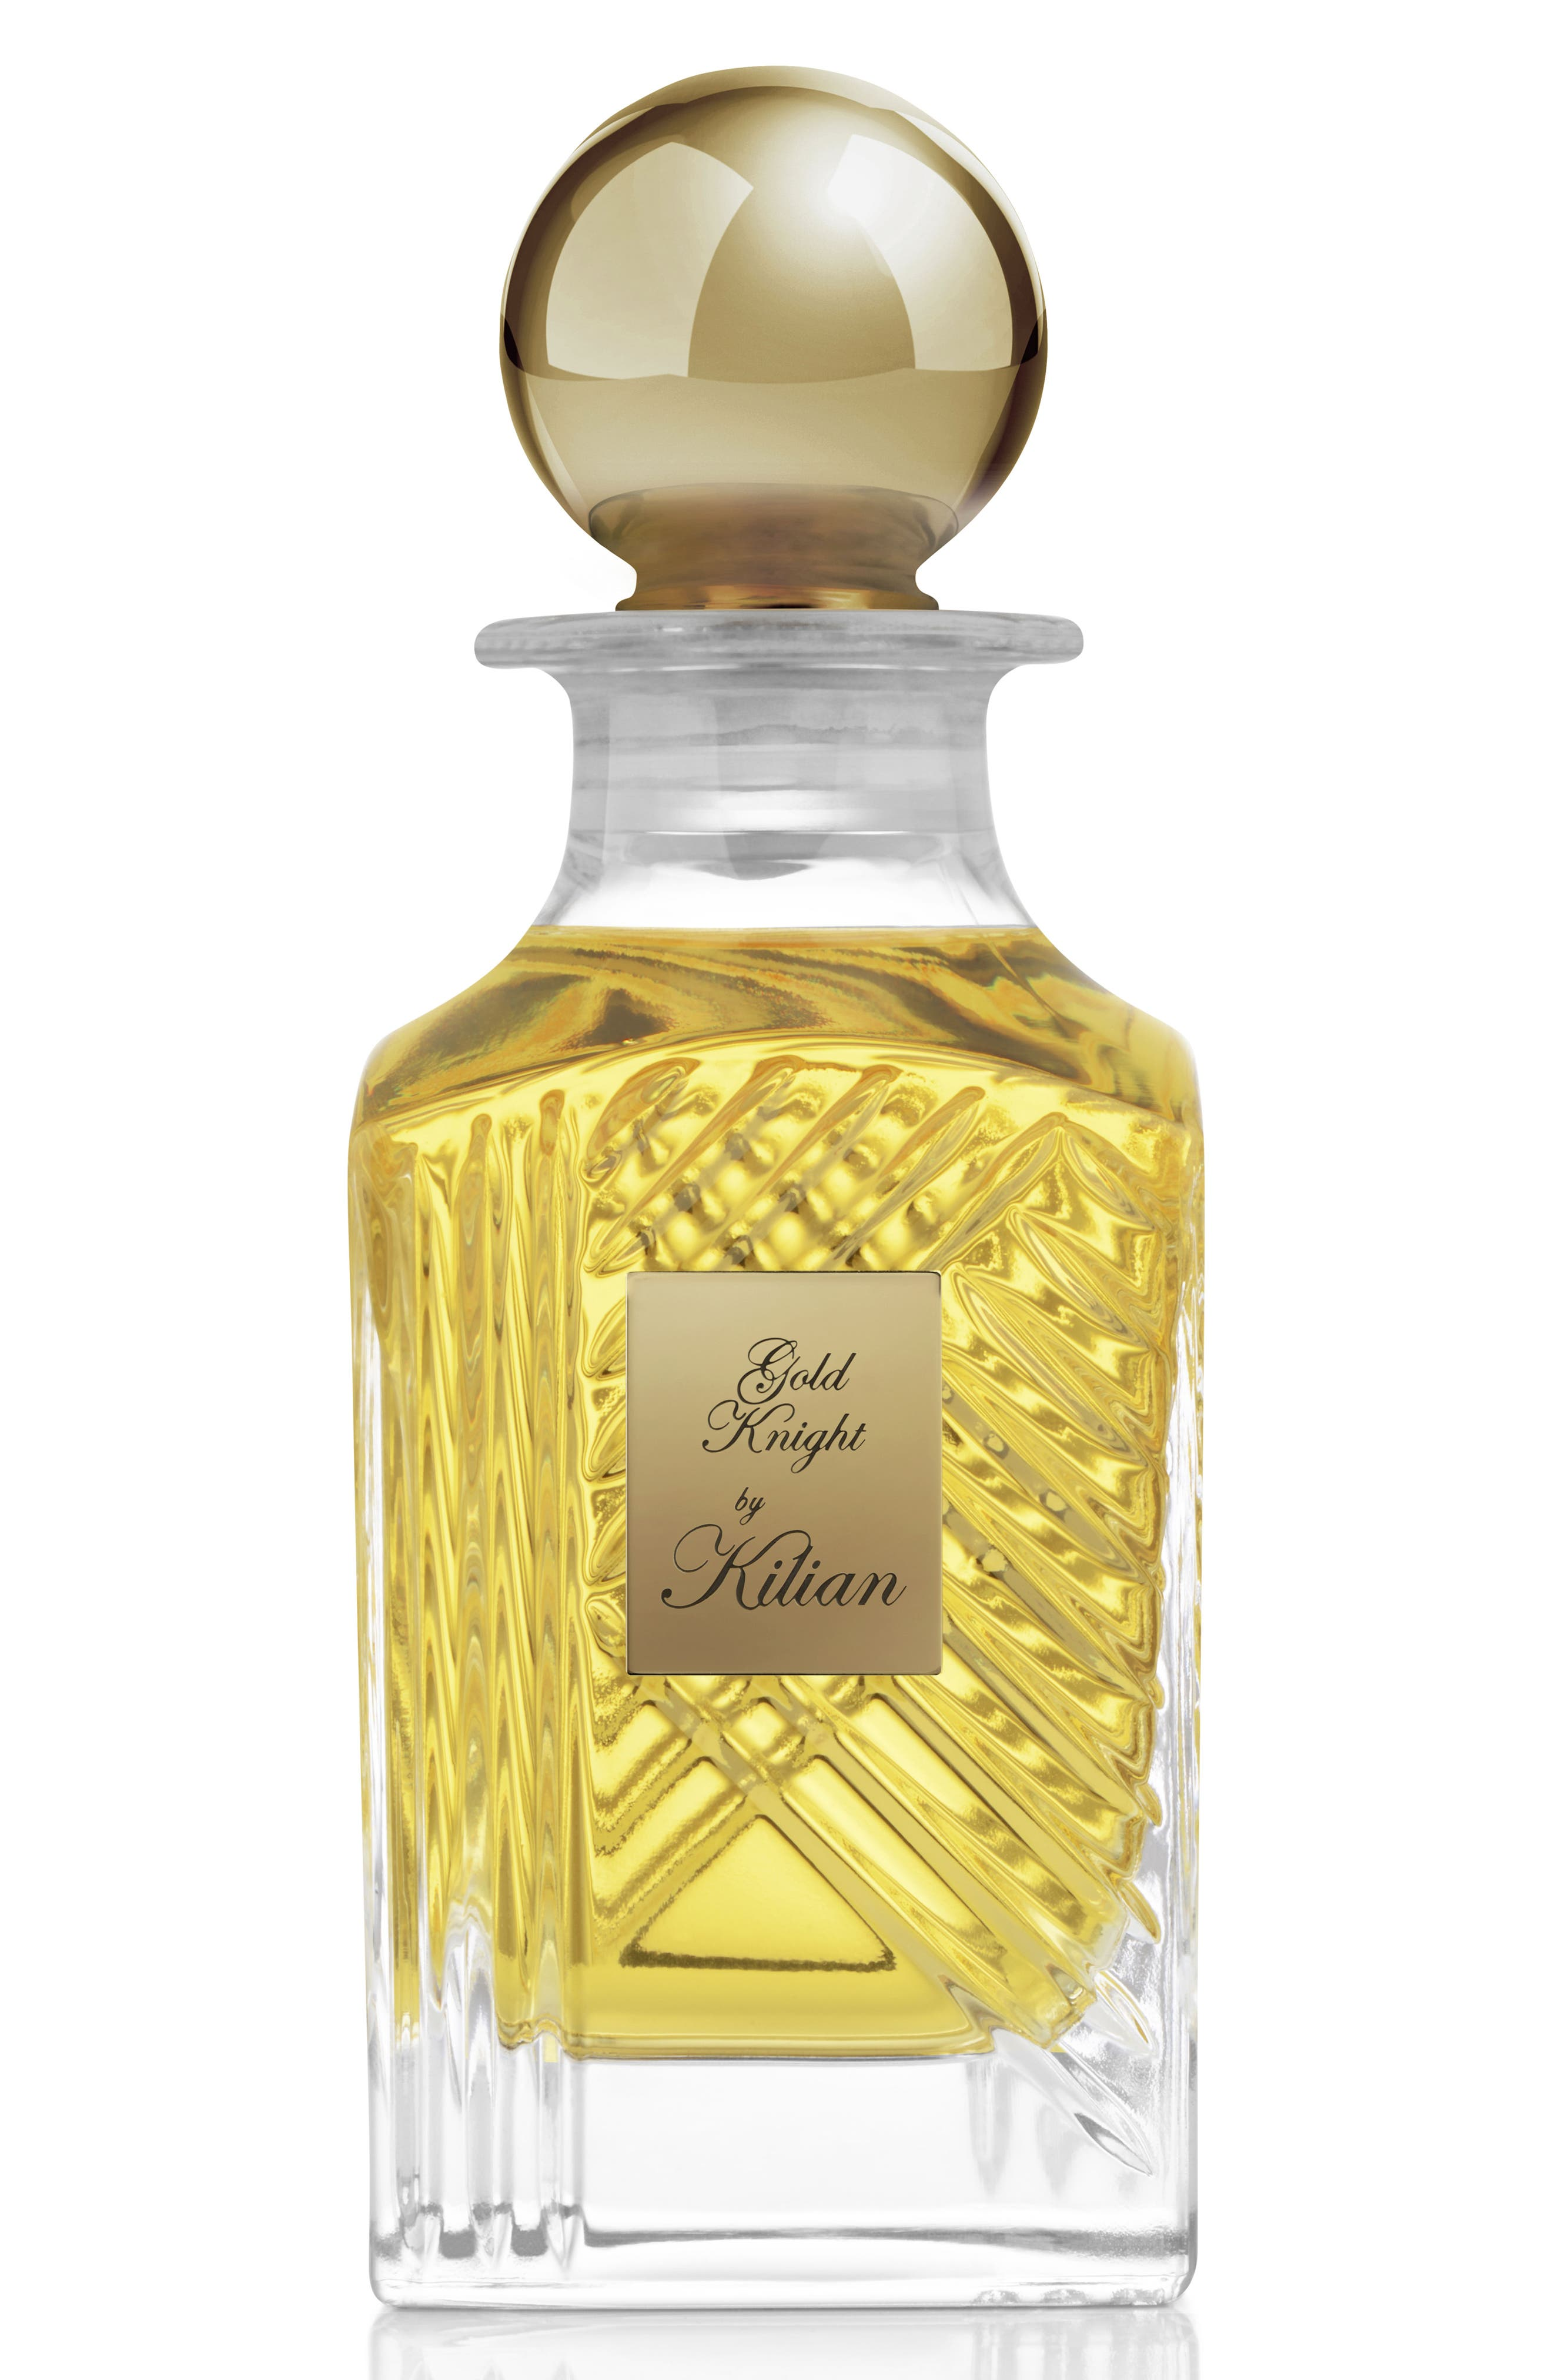 Gold Knight Mini Carafe Collector's Edition,                         Main,                         color, No Color